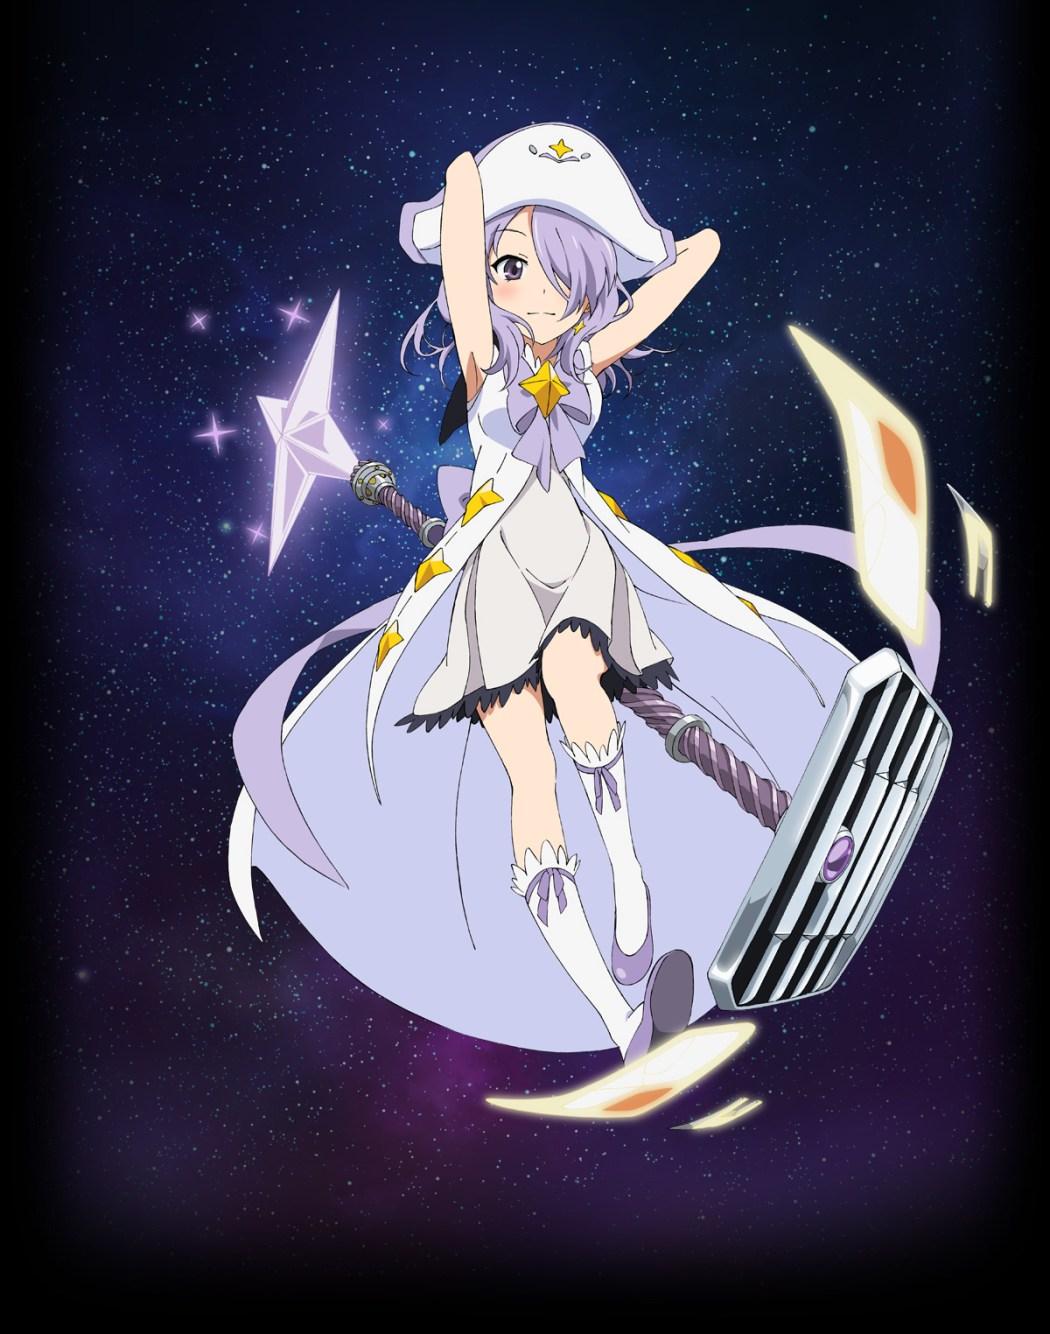 Houkago no Pleiades character design haruhichan.com wish upon the pleiades character design Nanako